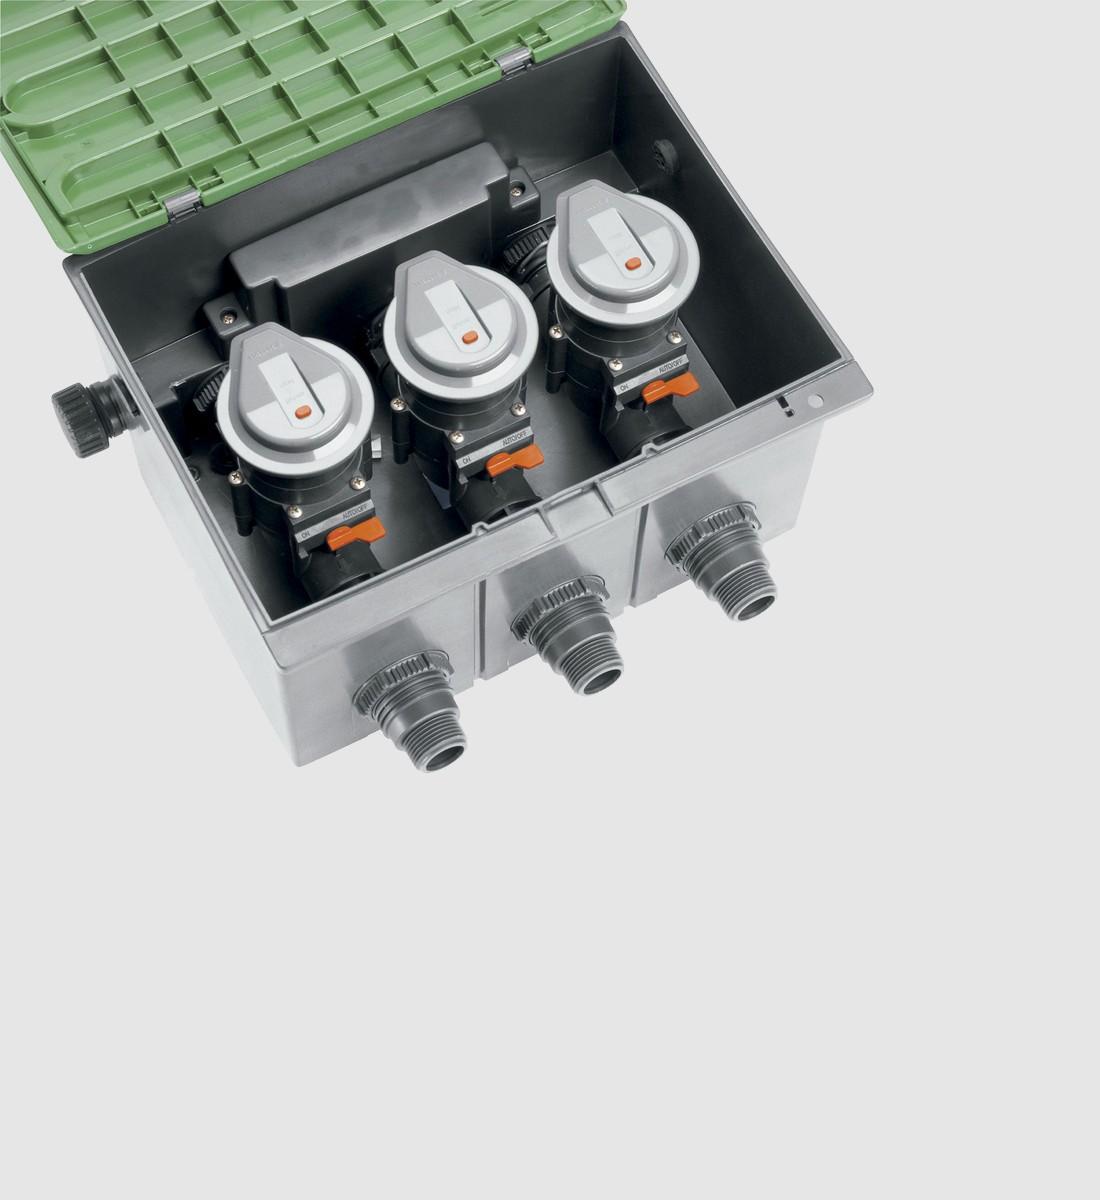 Ventilbox V3